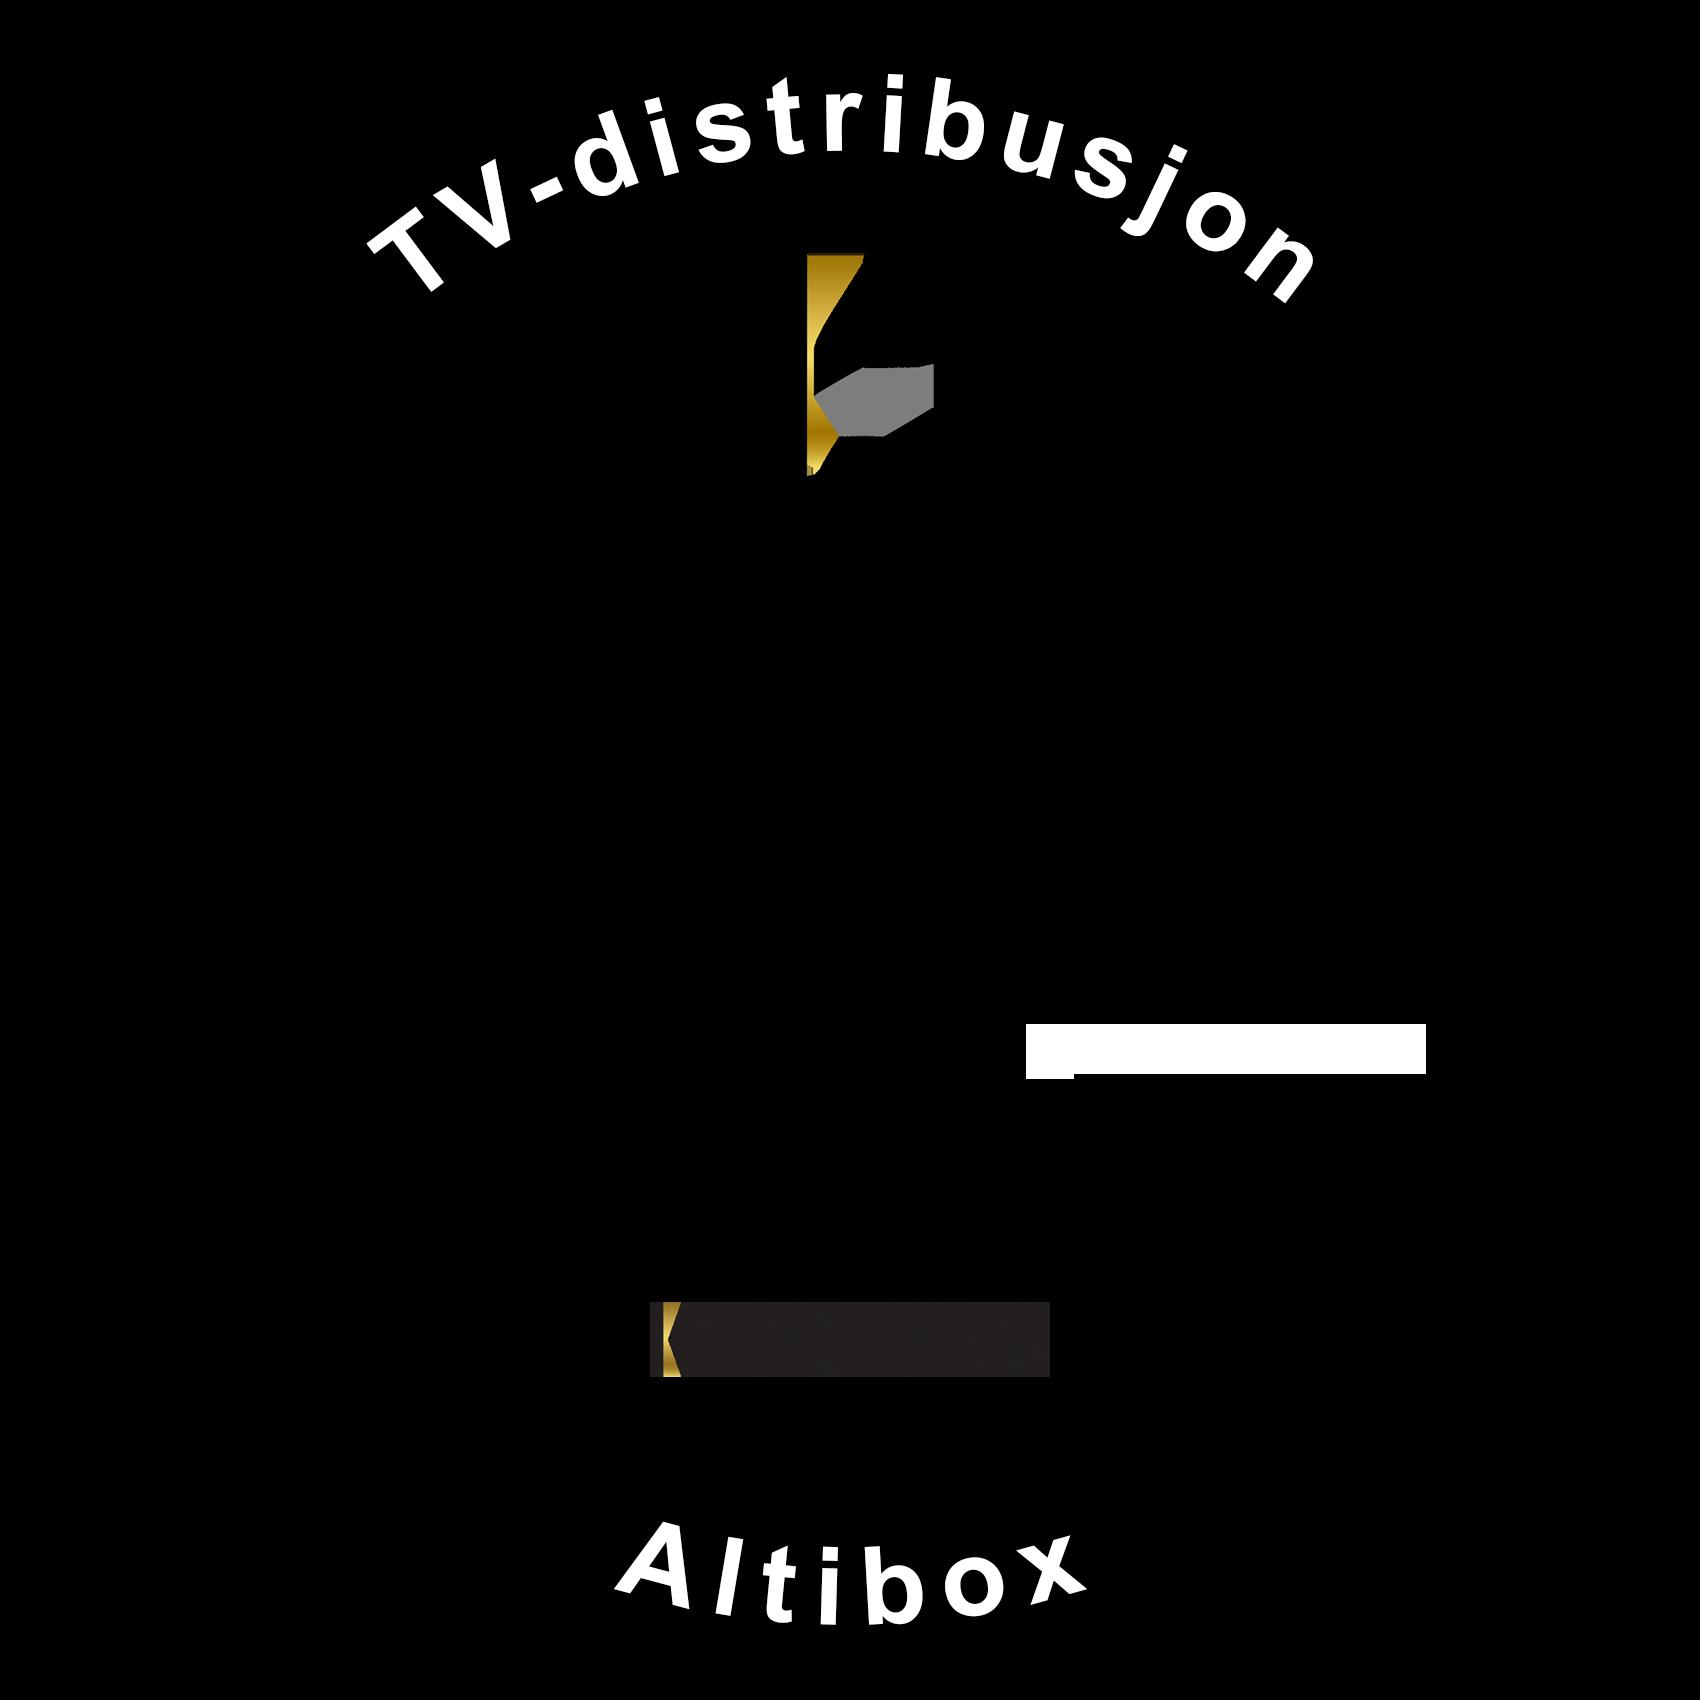 premiesymbol_tv_distribusjon_altibox